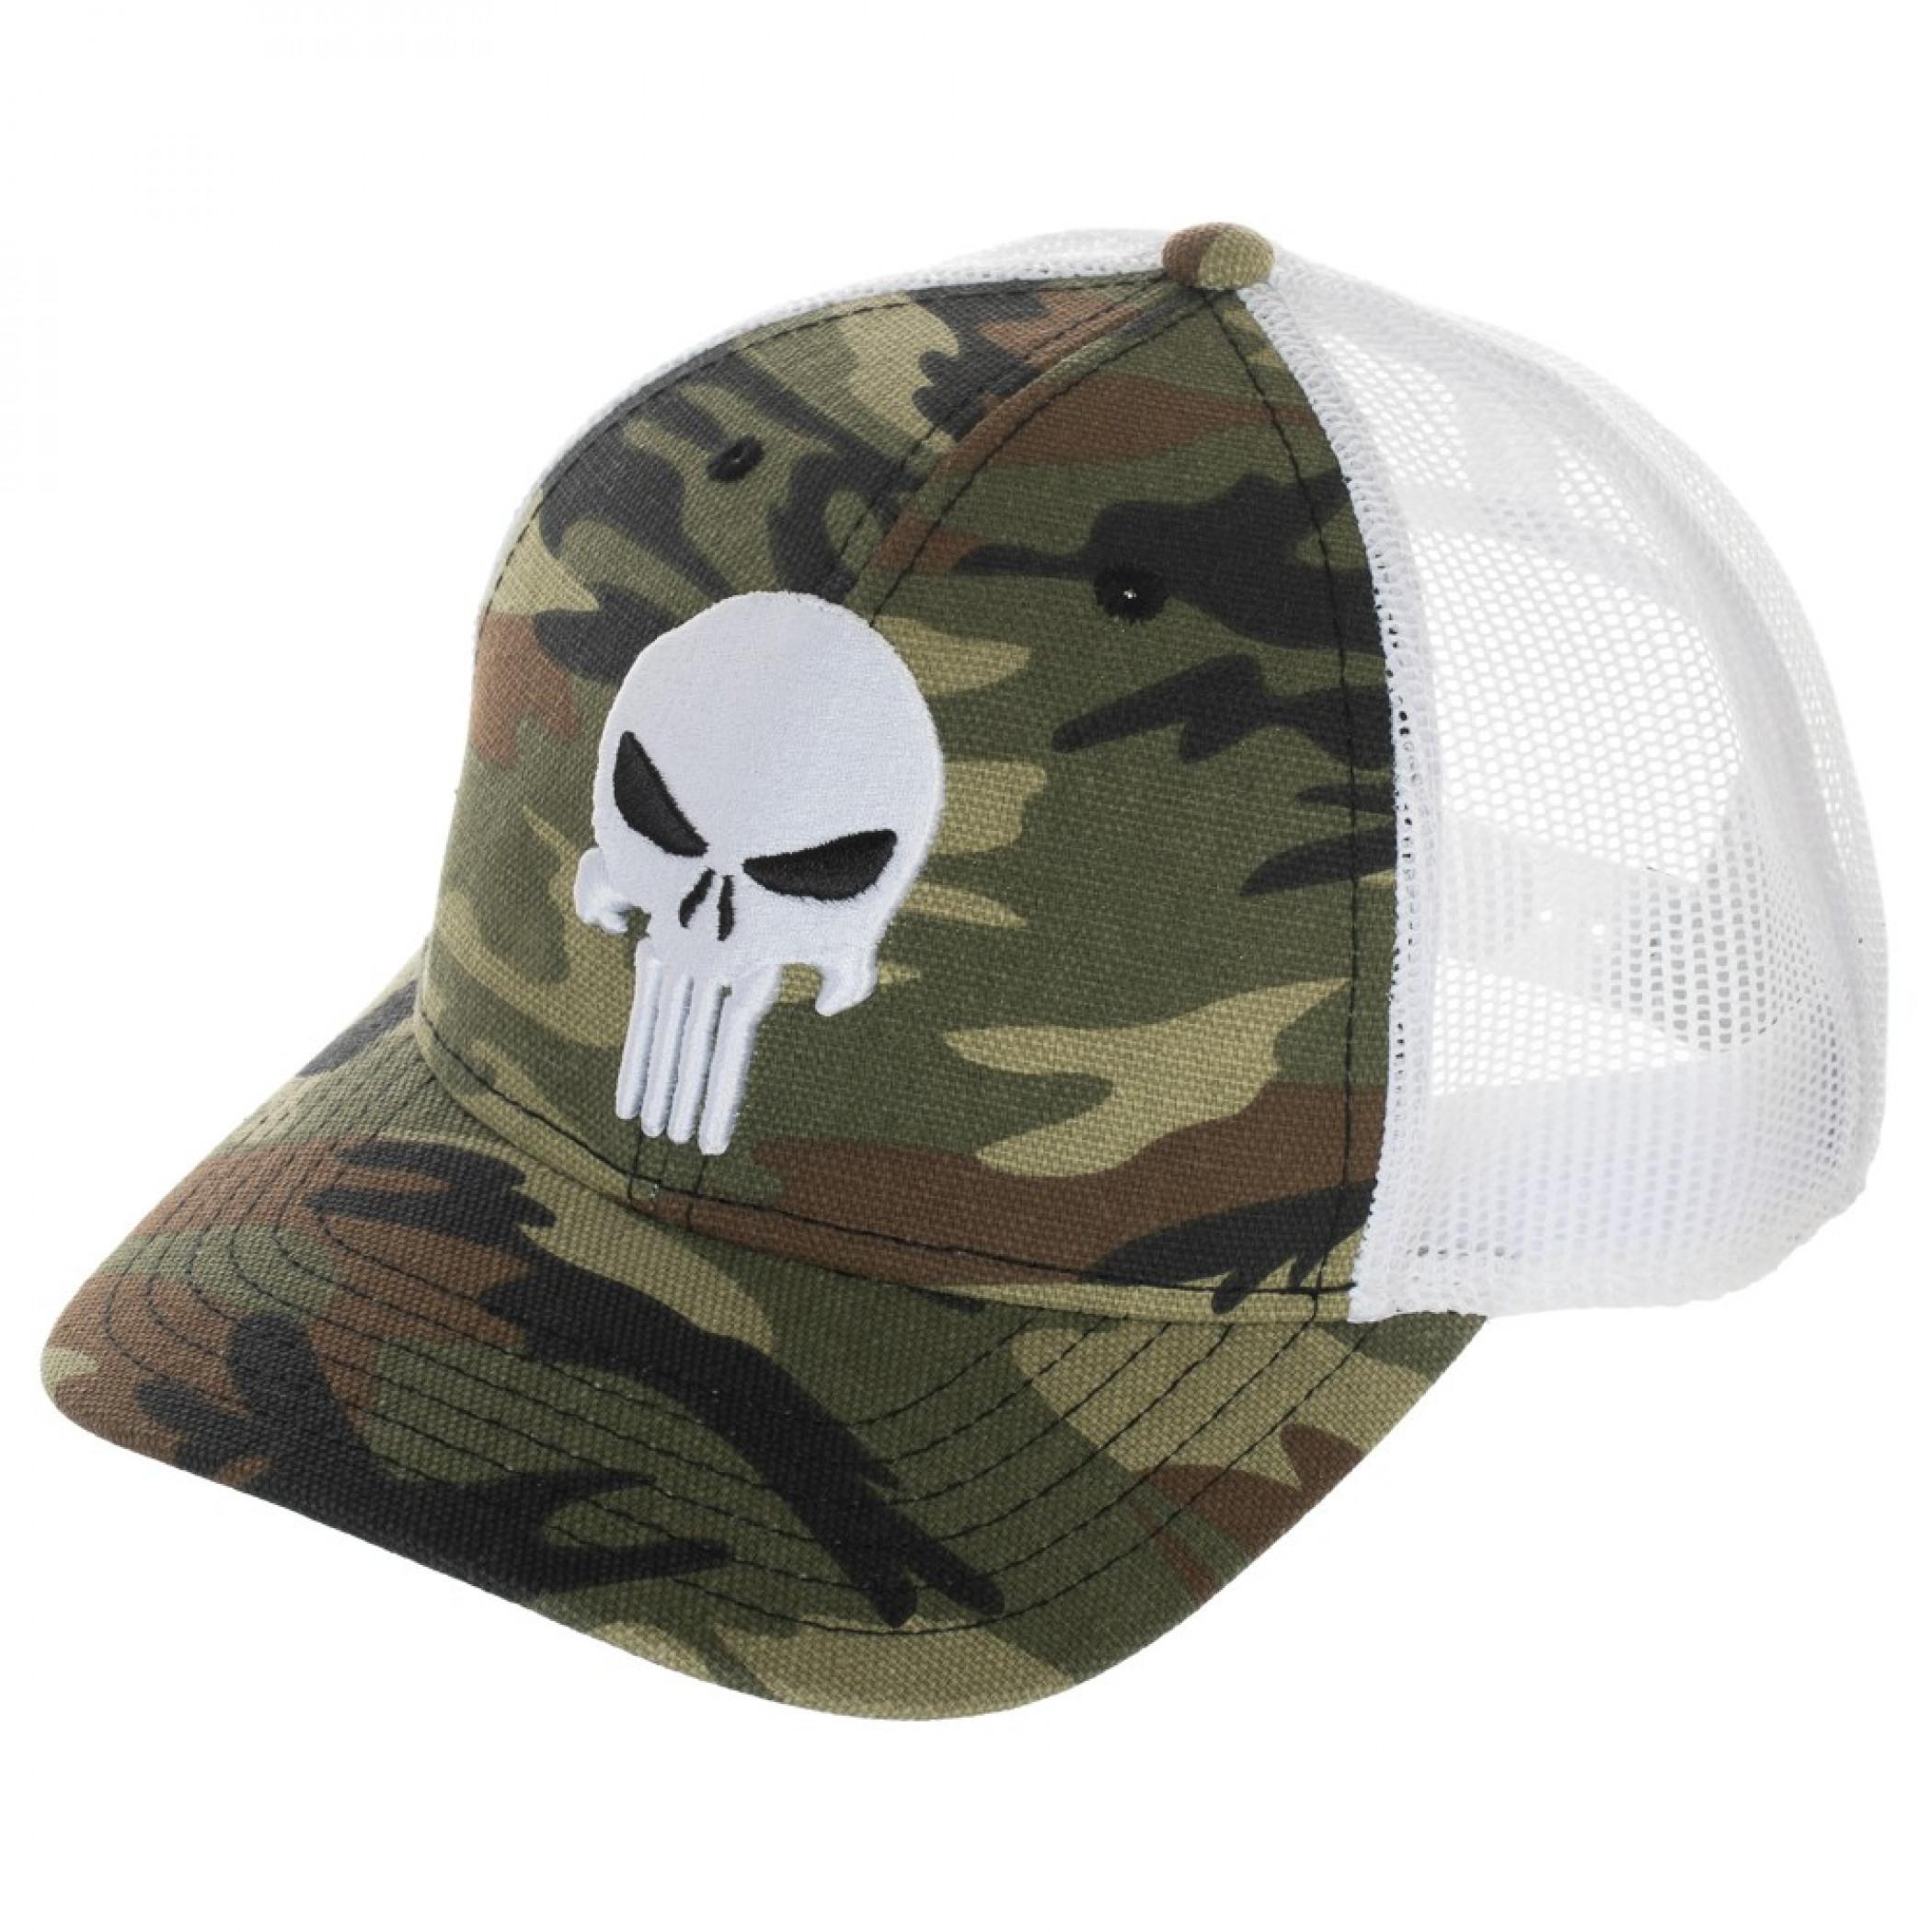 Punisher Camo Pre-Curved Adjustable Mesh Trucker Hat